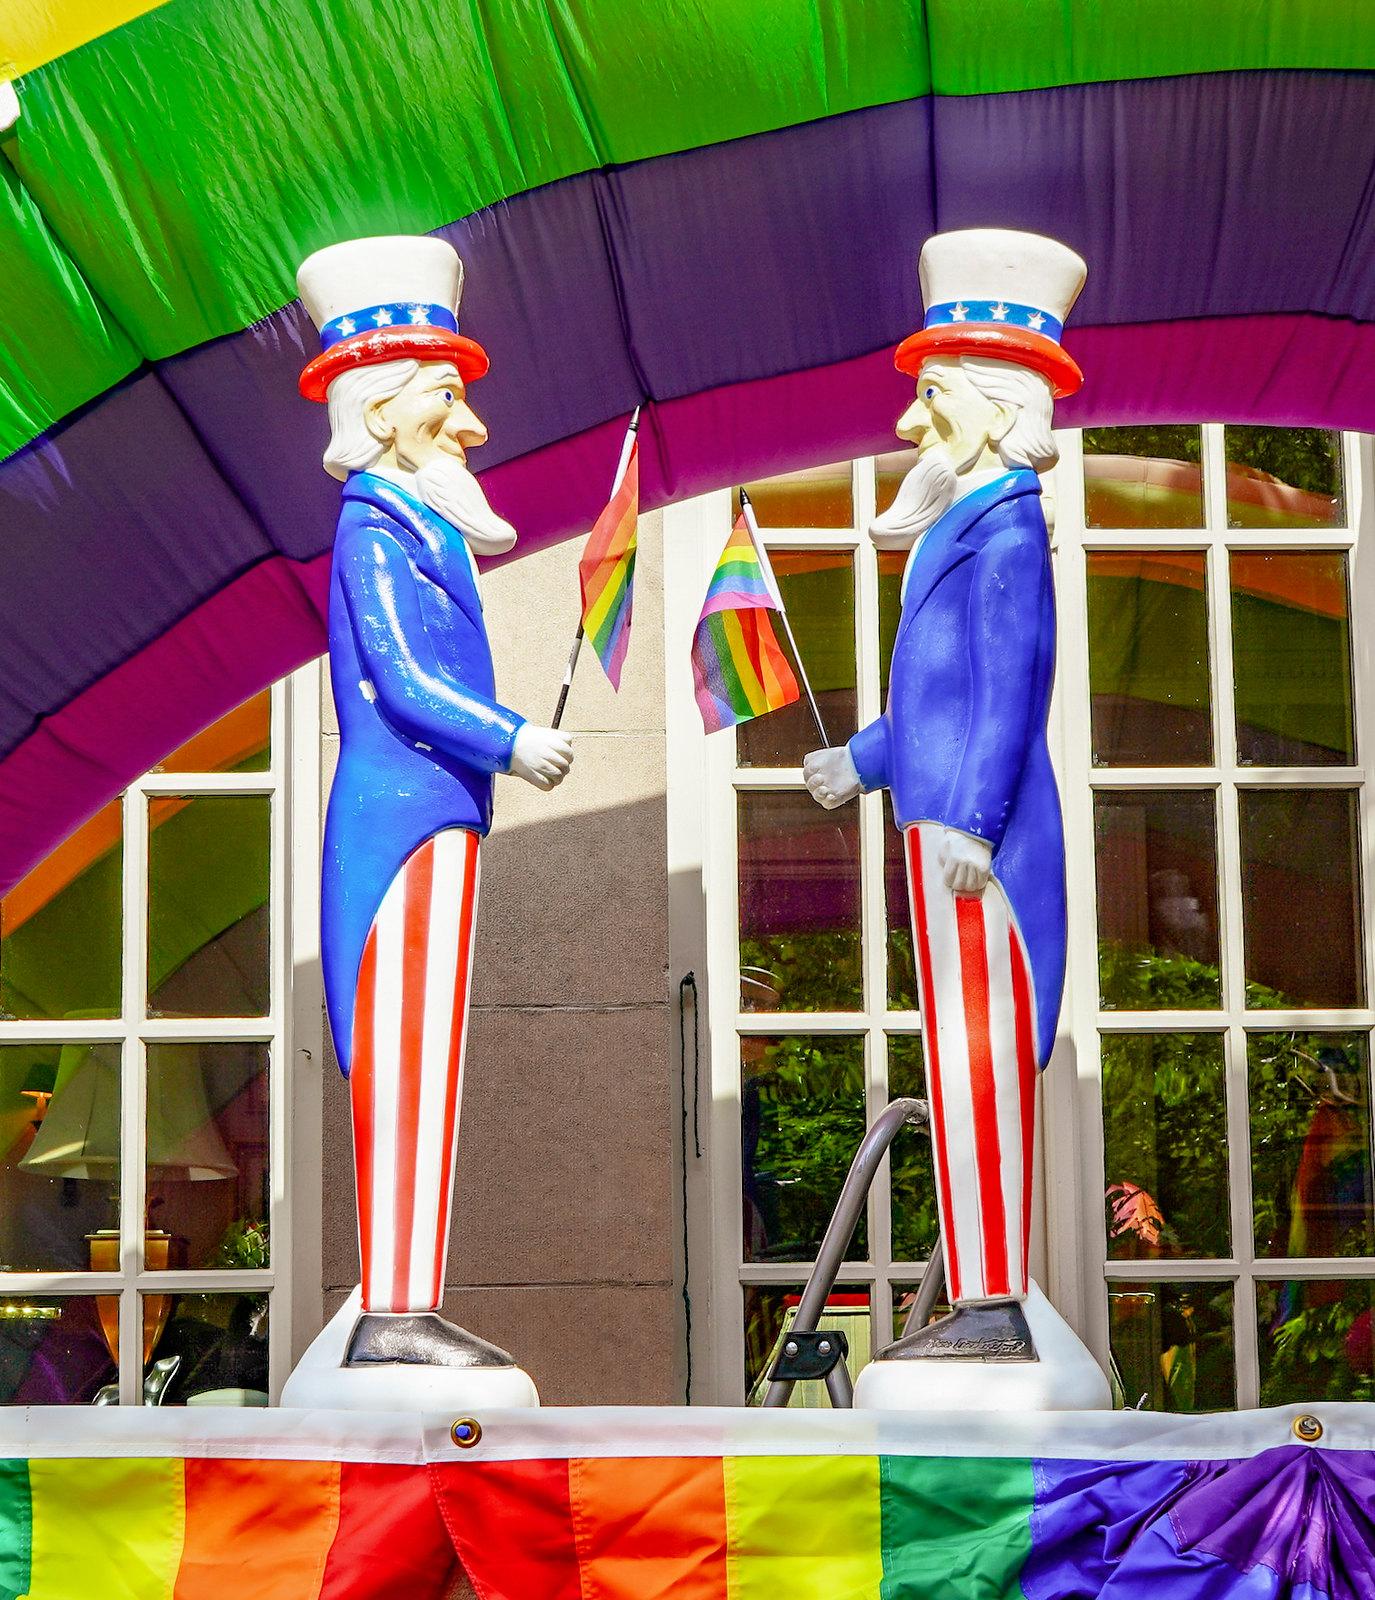 2018.06.08 Capital Pride People and Places with Sony A7 III, Washington, DC USA 02879